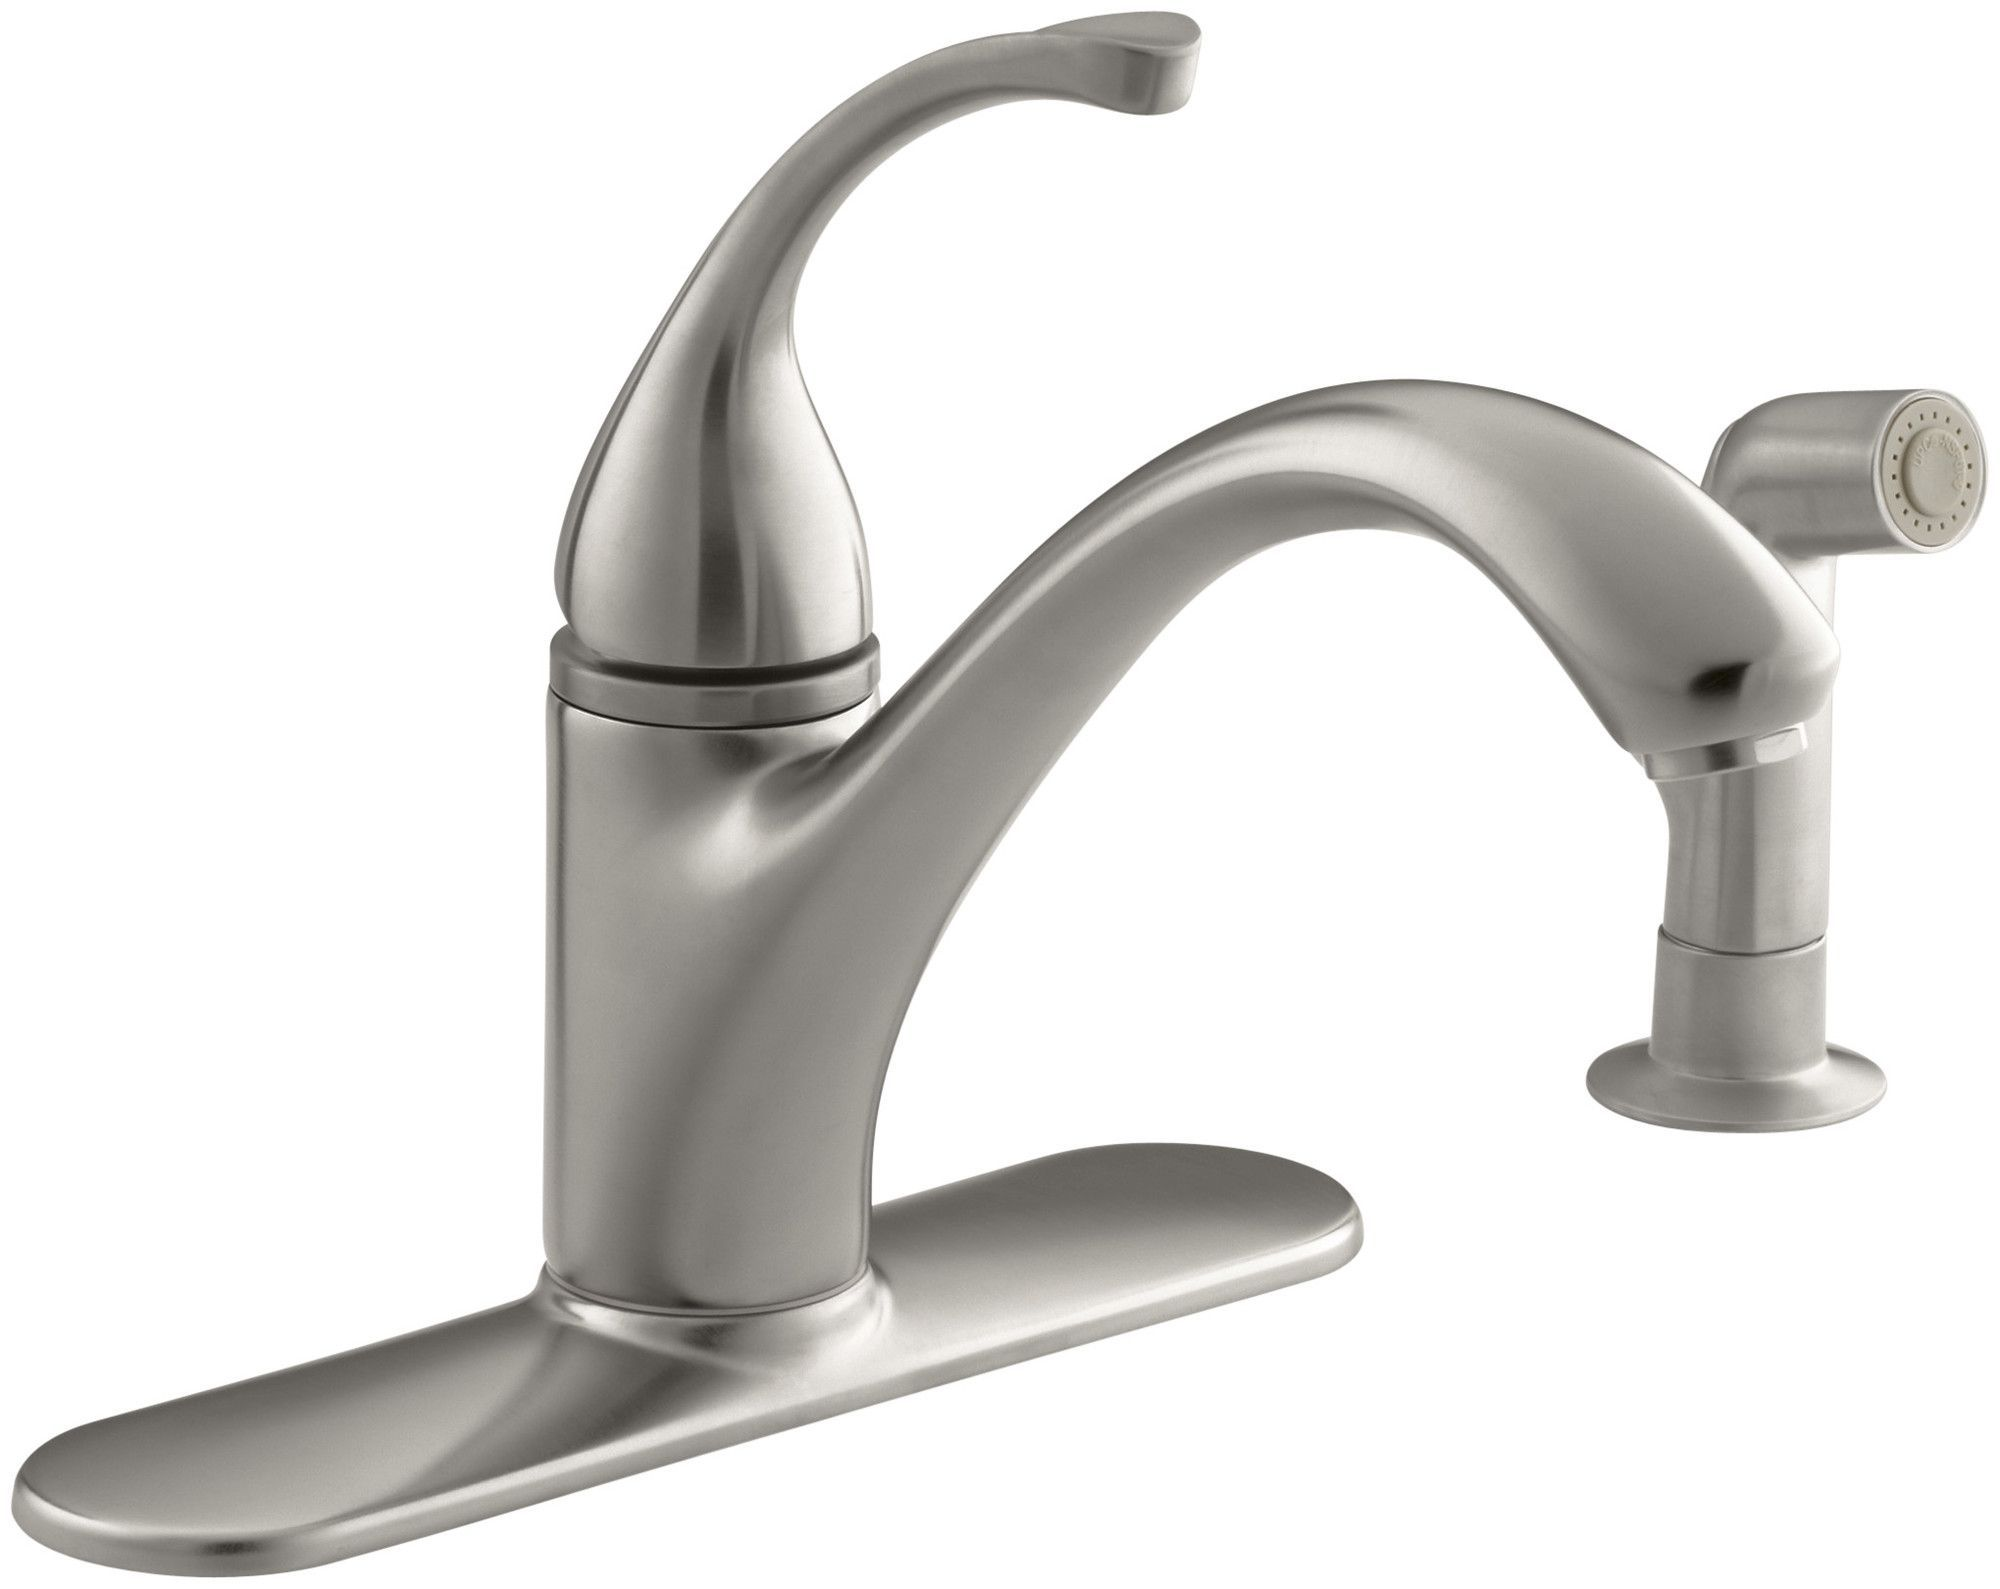 "Forté 4Hole Kitchen Sink Faucet With 9116"" Spout Matching Delectable 4 Hole Kitchen Faucet Design Inspiration"